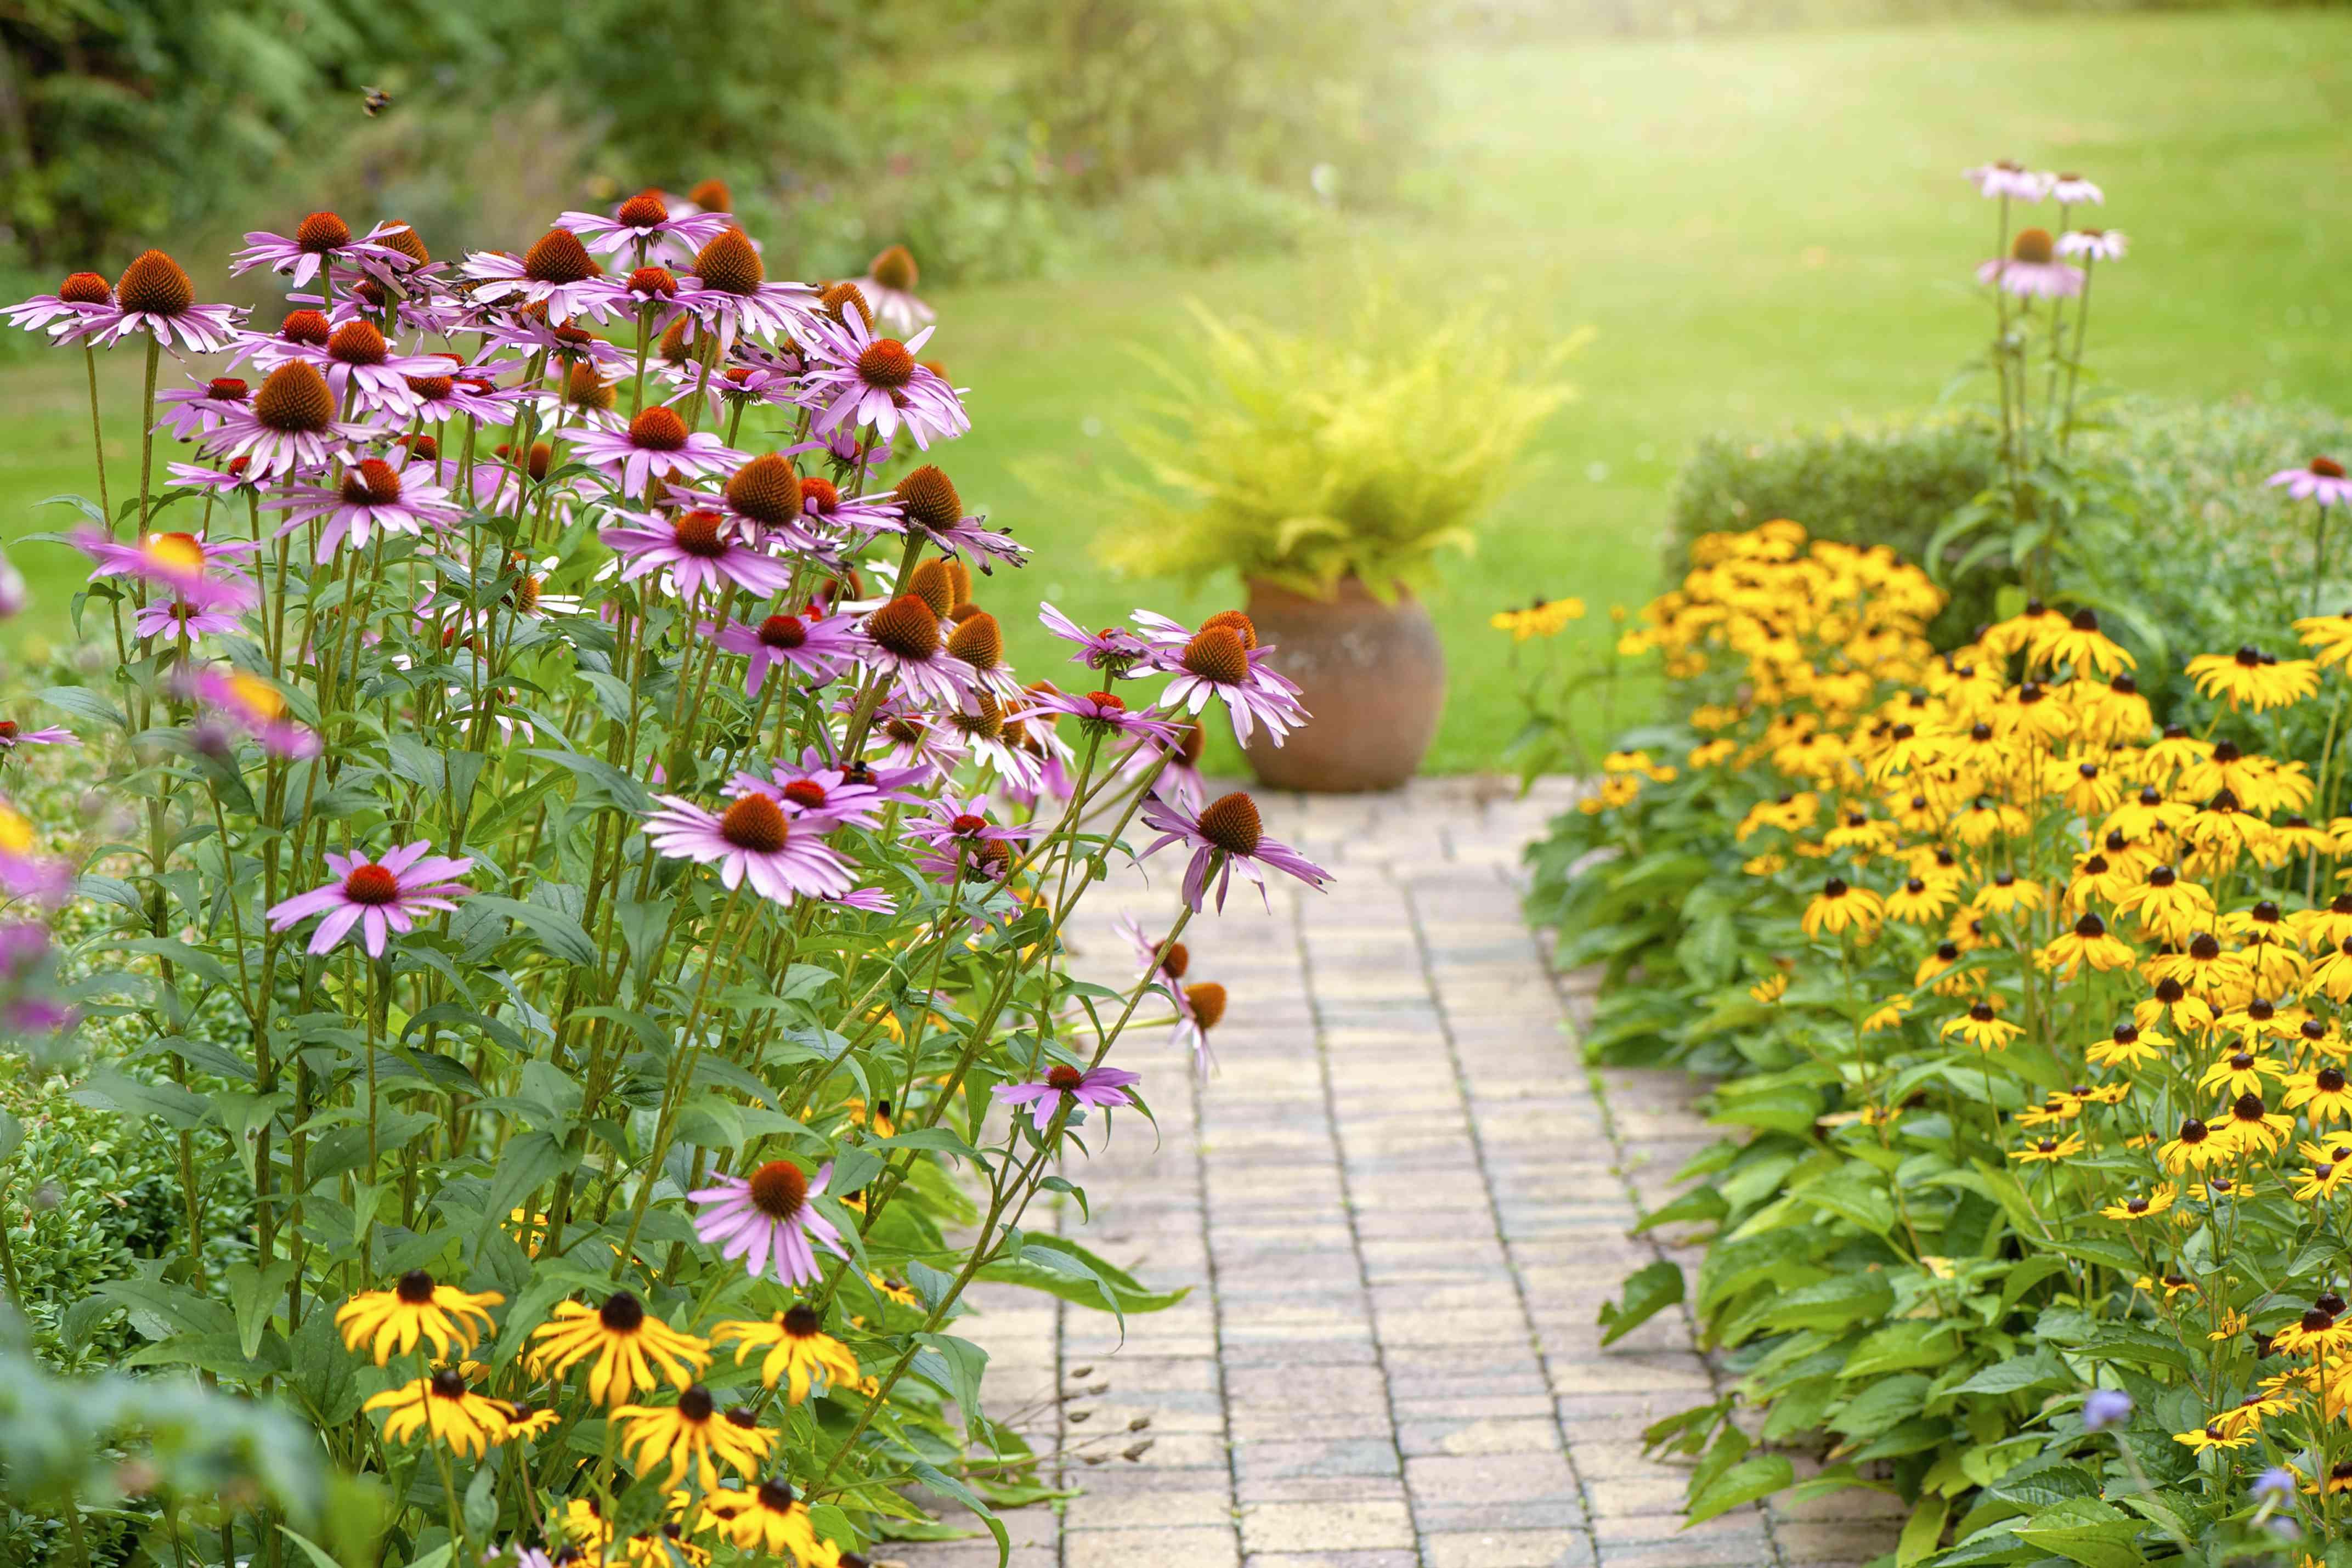 Beautiful summer garden flower border with Echinacea purpurea, Rudbeckia yellow coneflowers